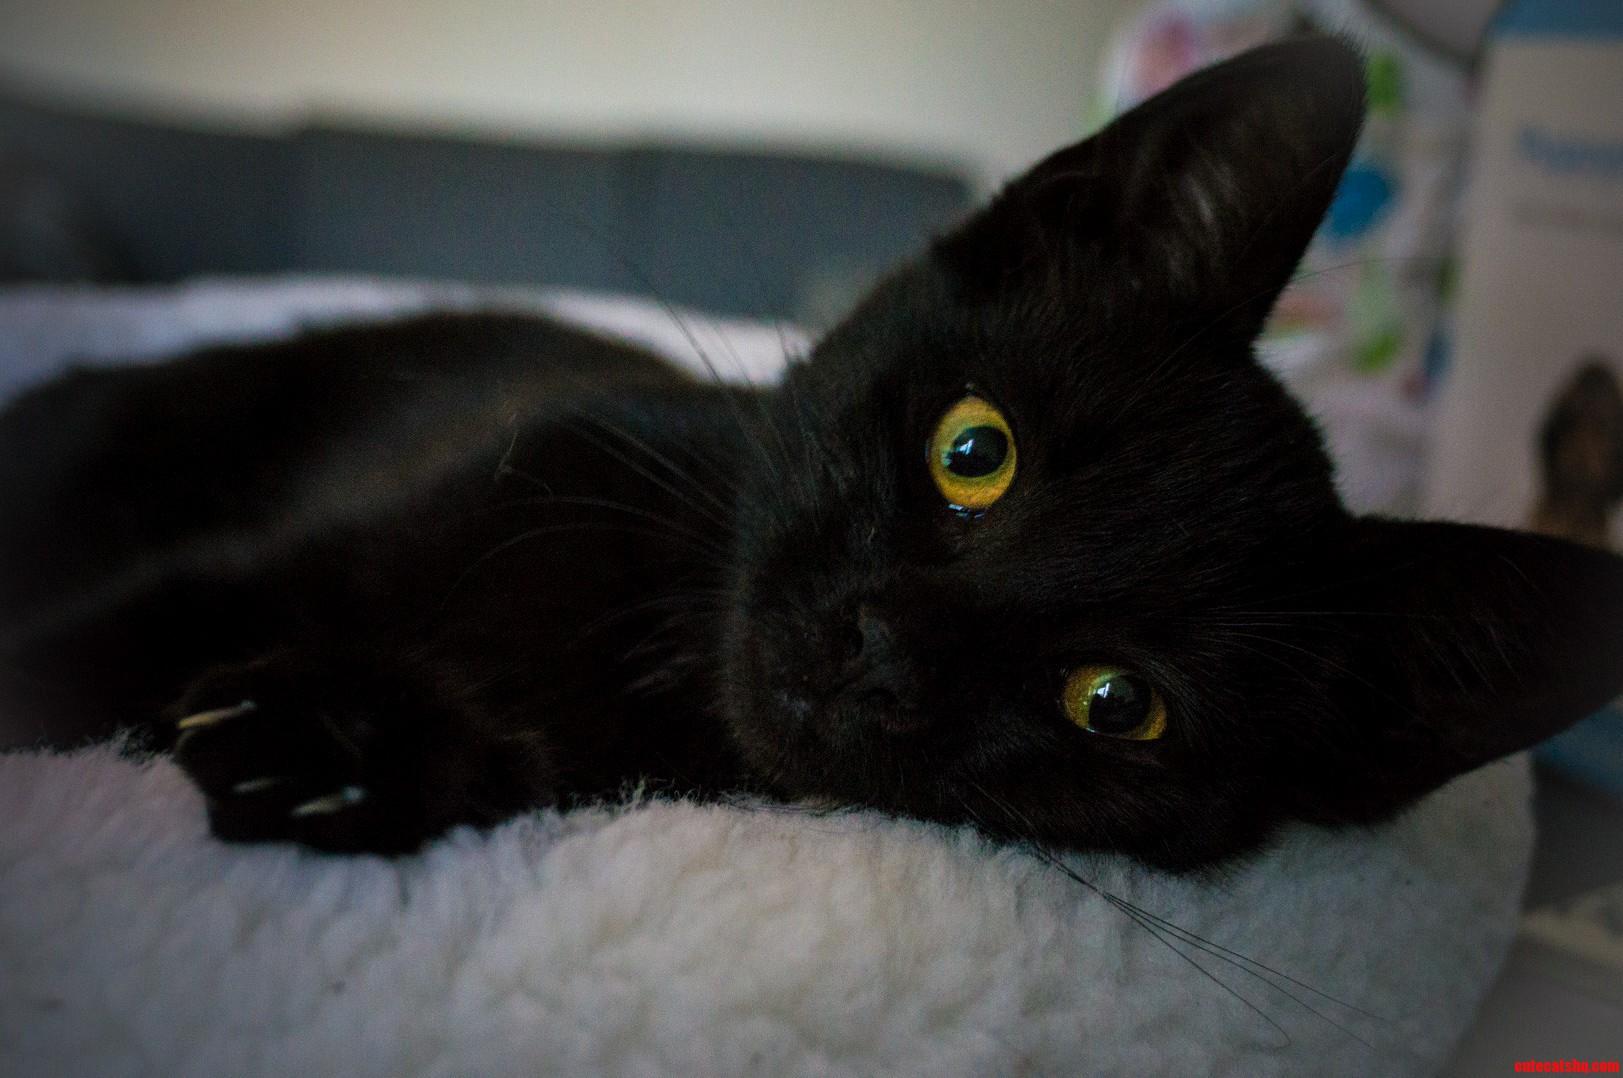 Saved A Kitten My First Kitten Ever. Rcats Got Any Tips For A Newbie